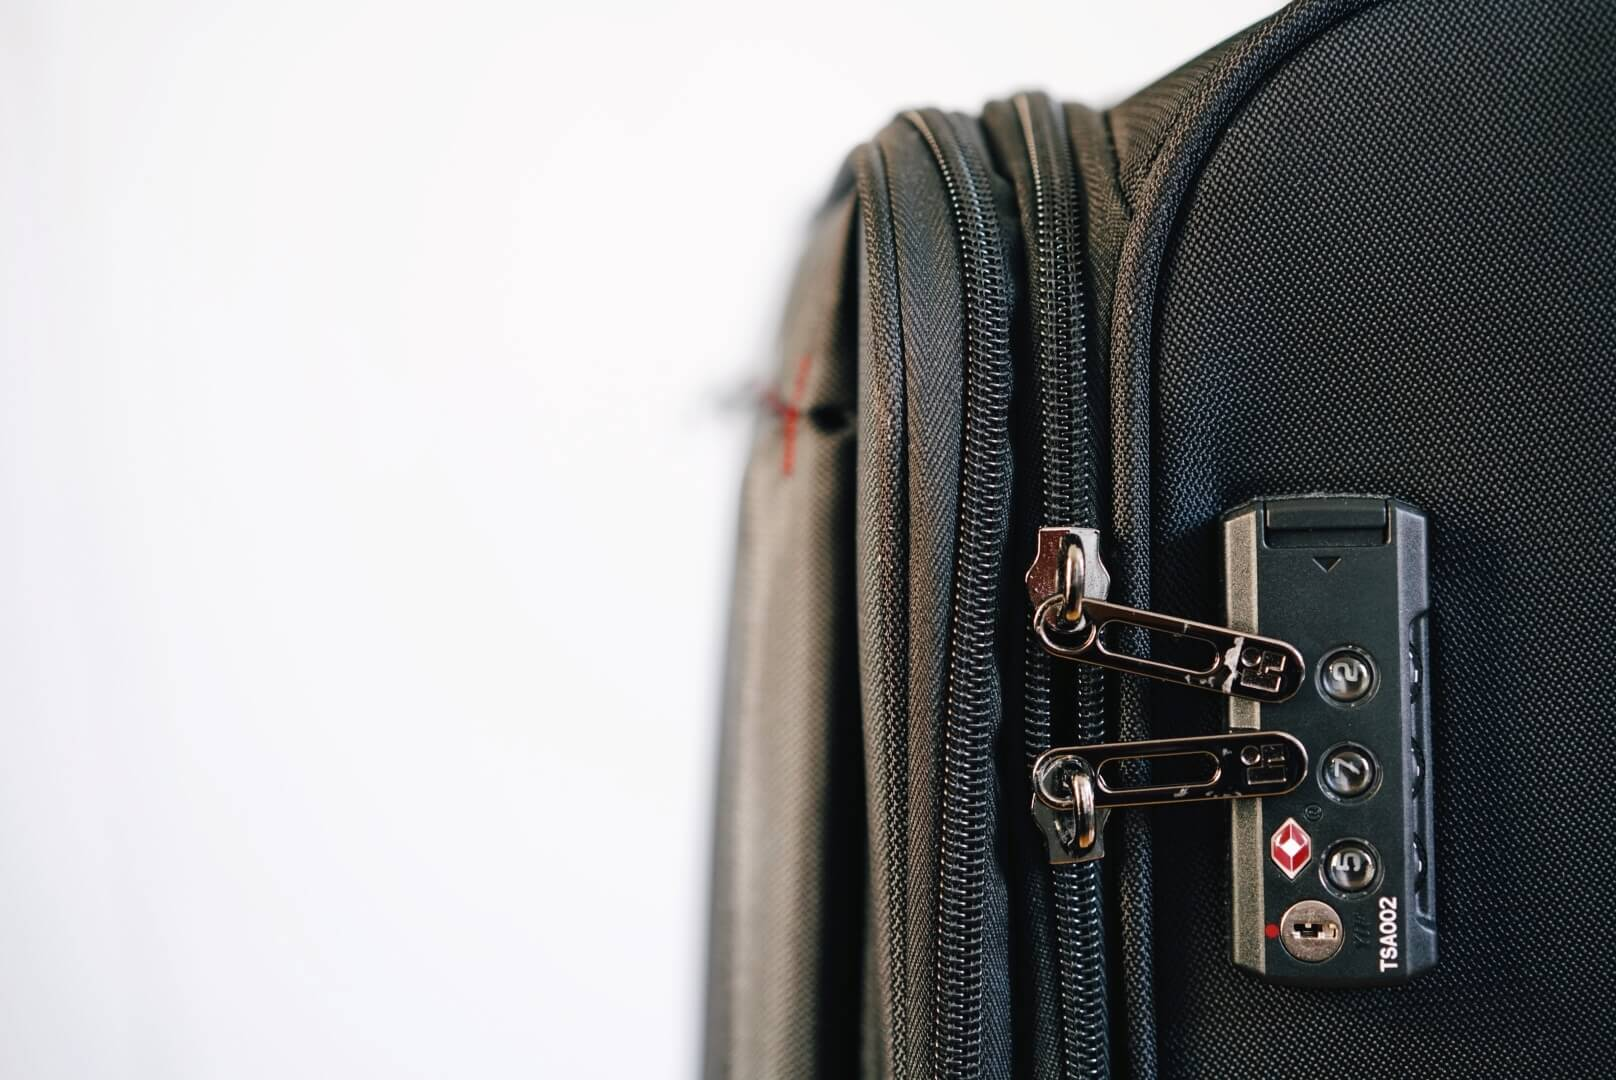 hideo wakamatsu fly2のスーツケースのTSA